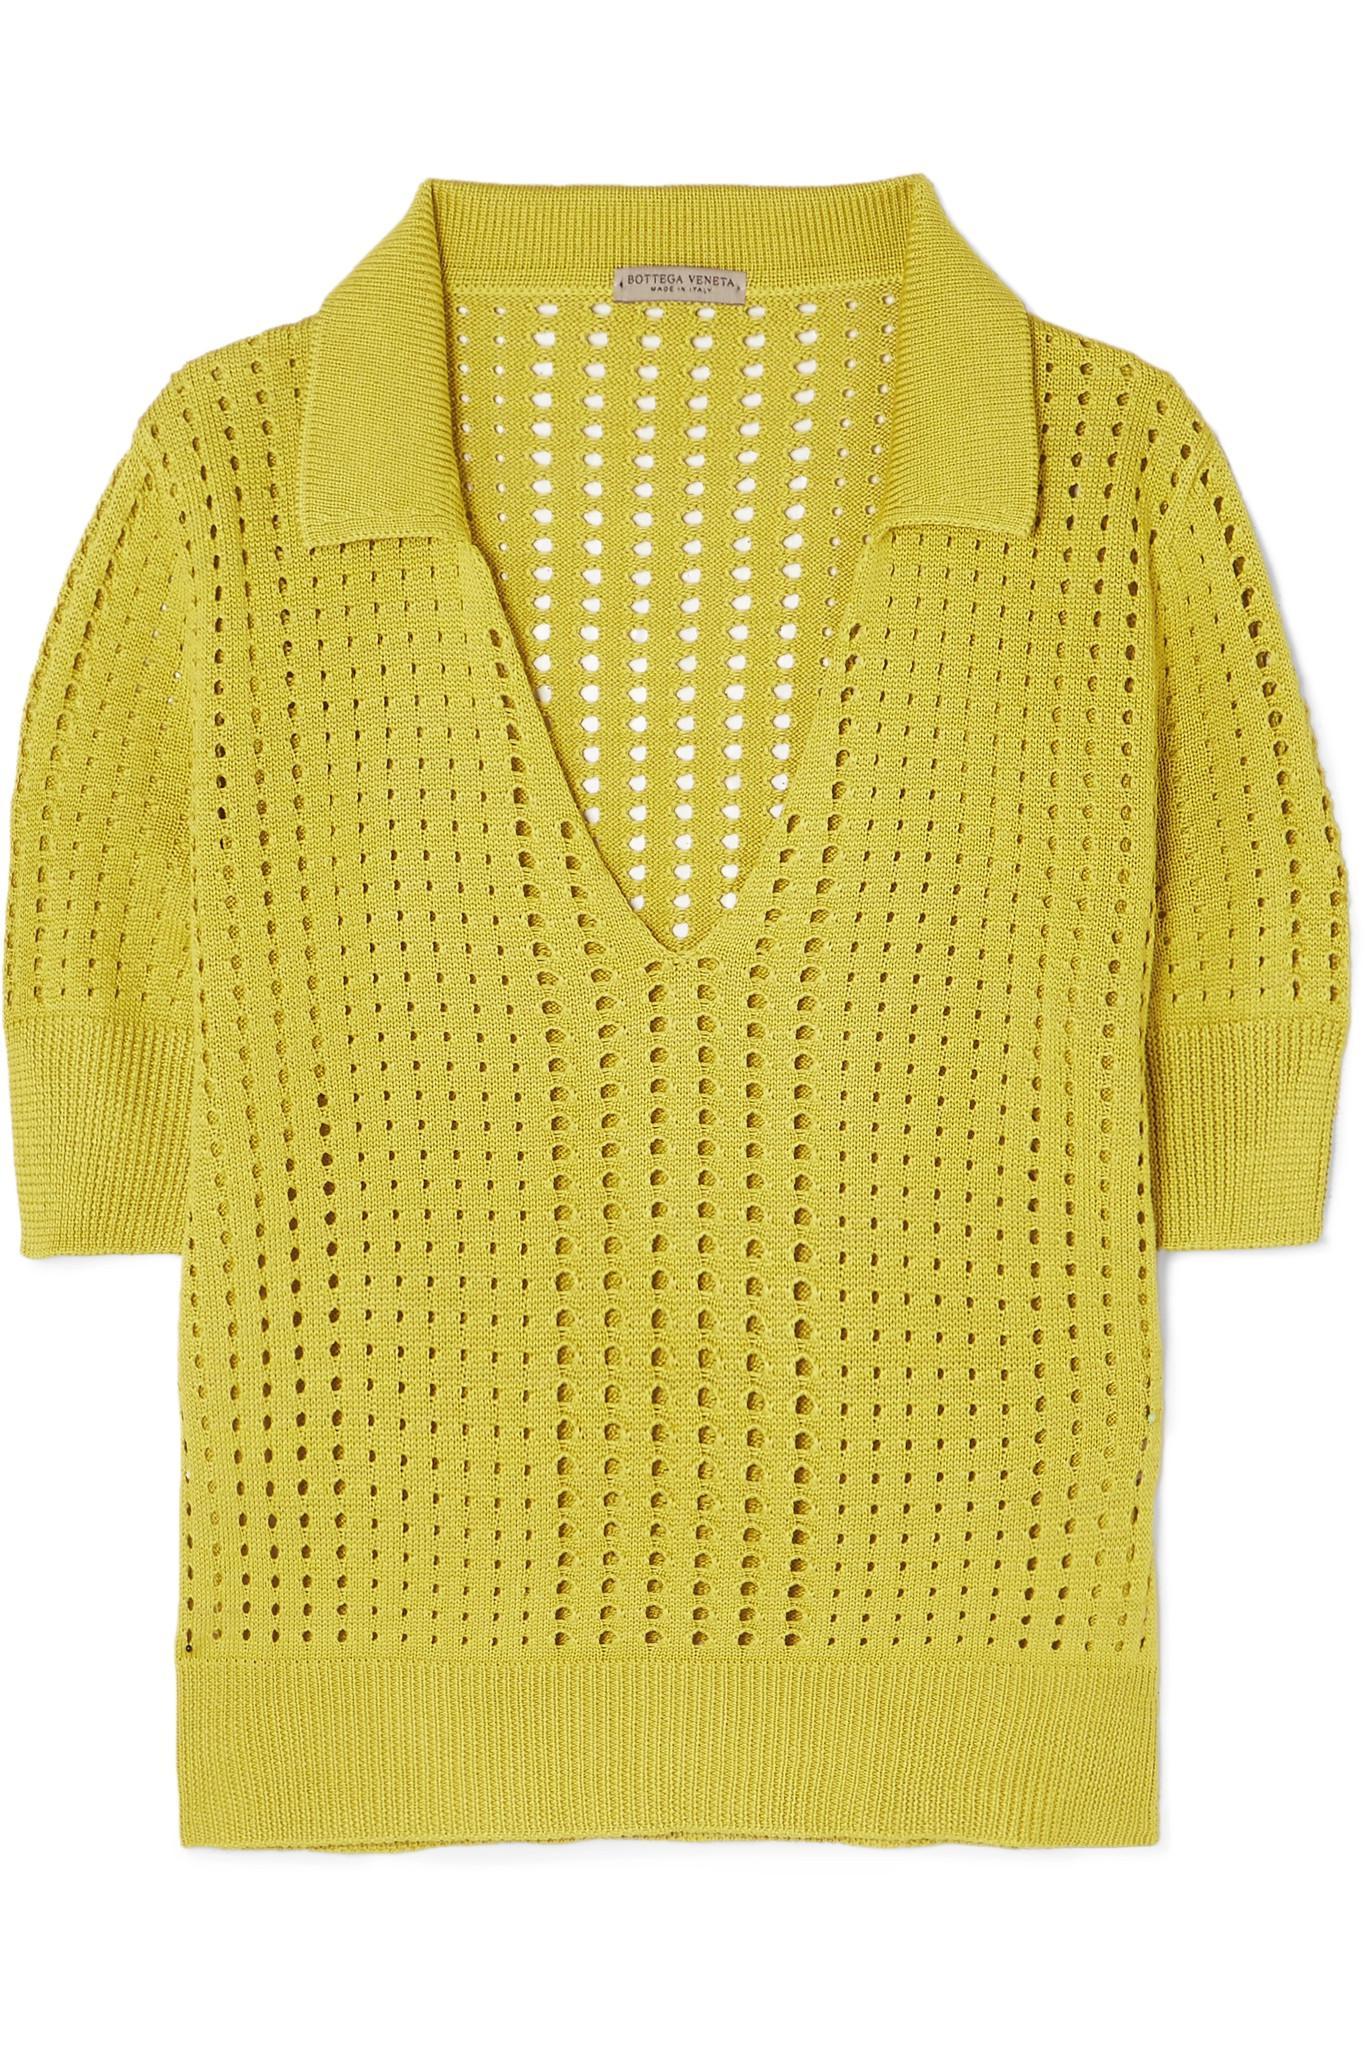 Explorer Prix Pas Cher Vente Pas Cher Abordable Silk Satin-trimmed Knitted Shirt - PeachBottega Veneta wR4yS